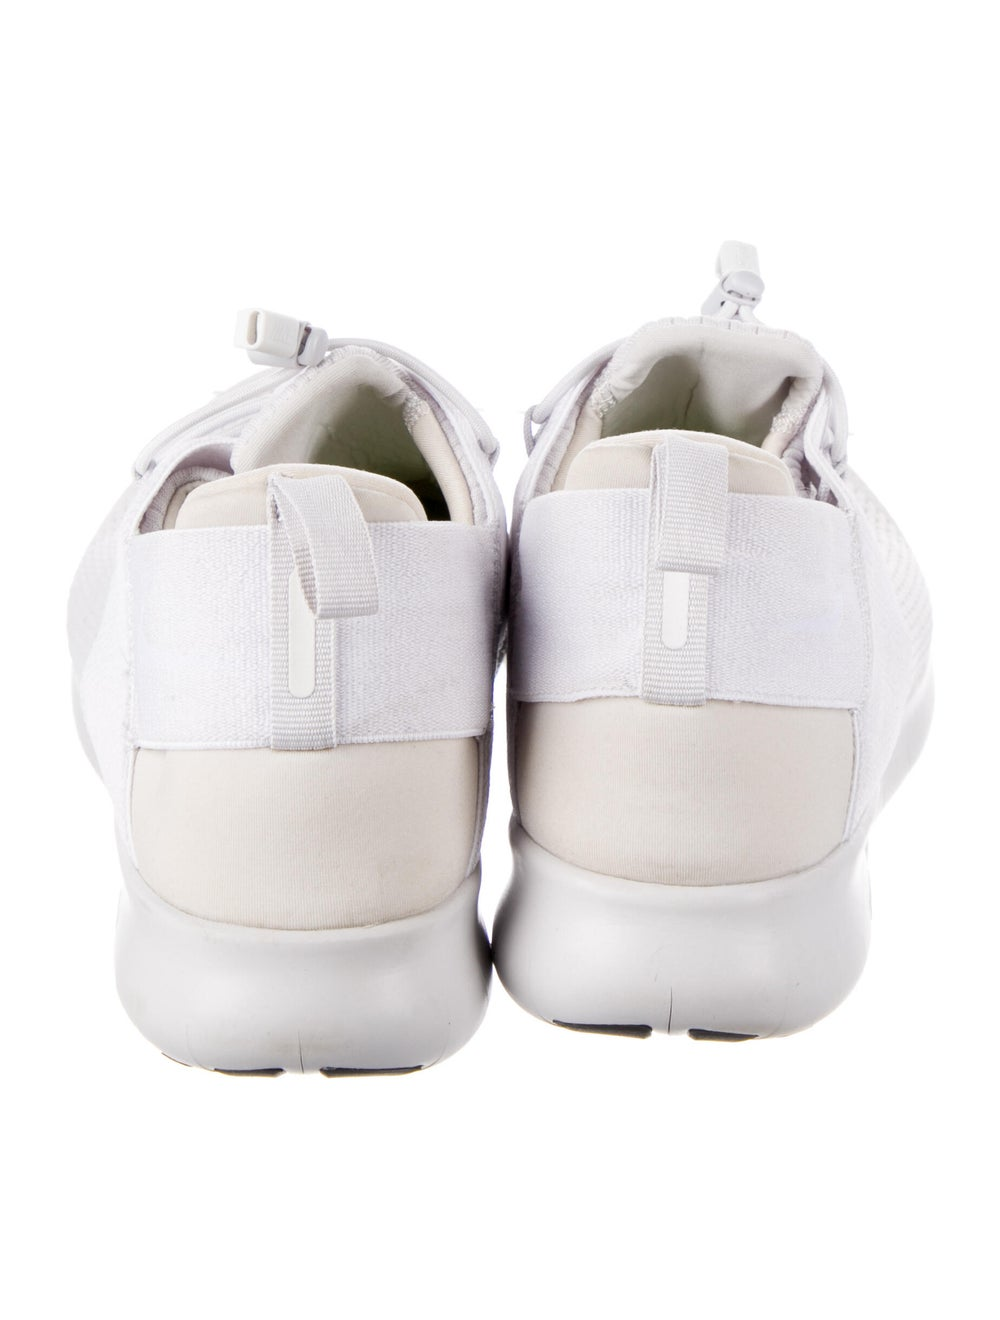 Nike Sneakers White - image 4